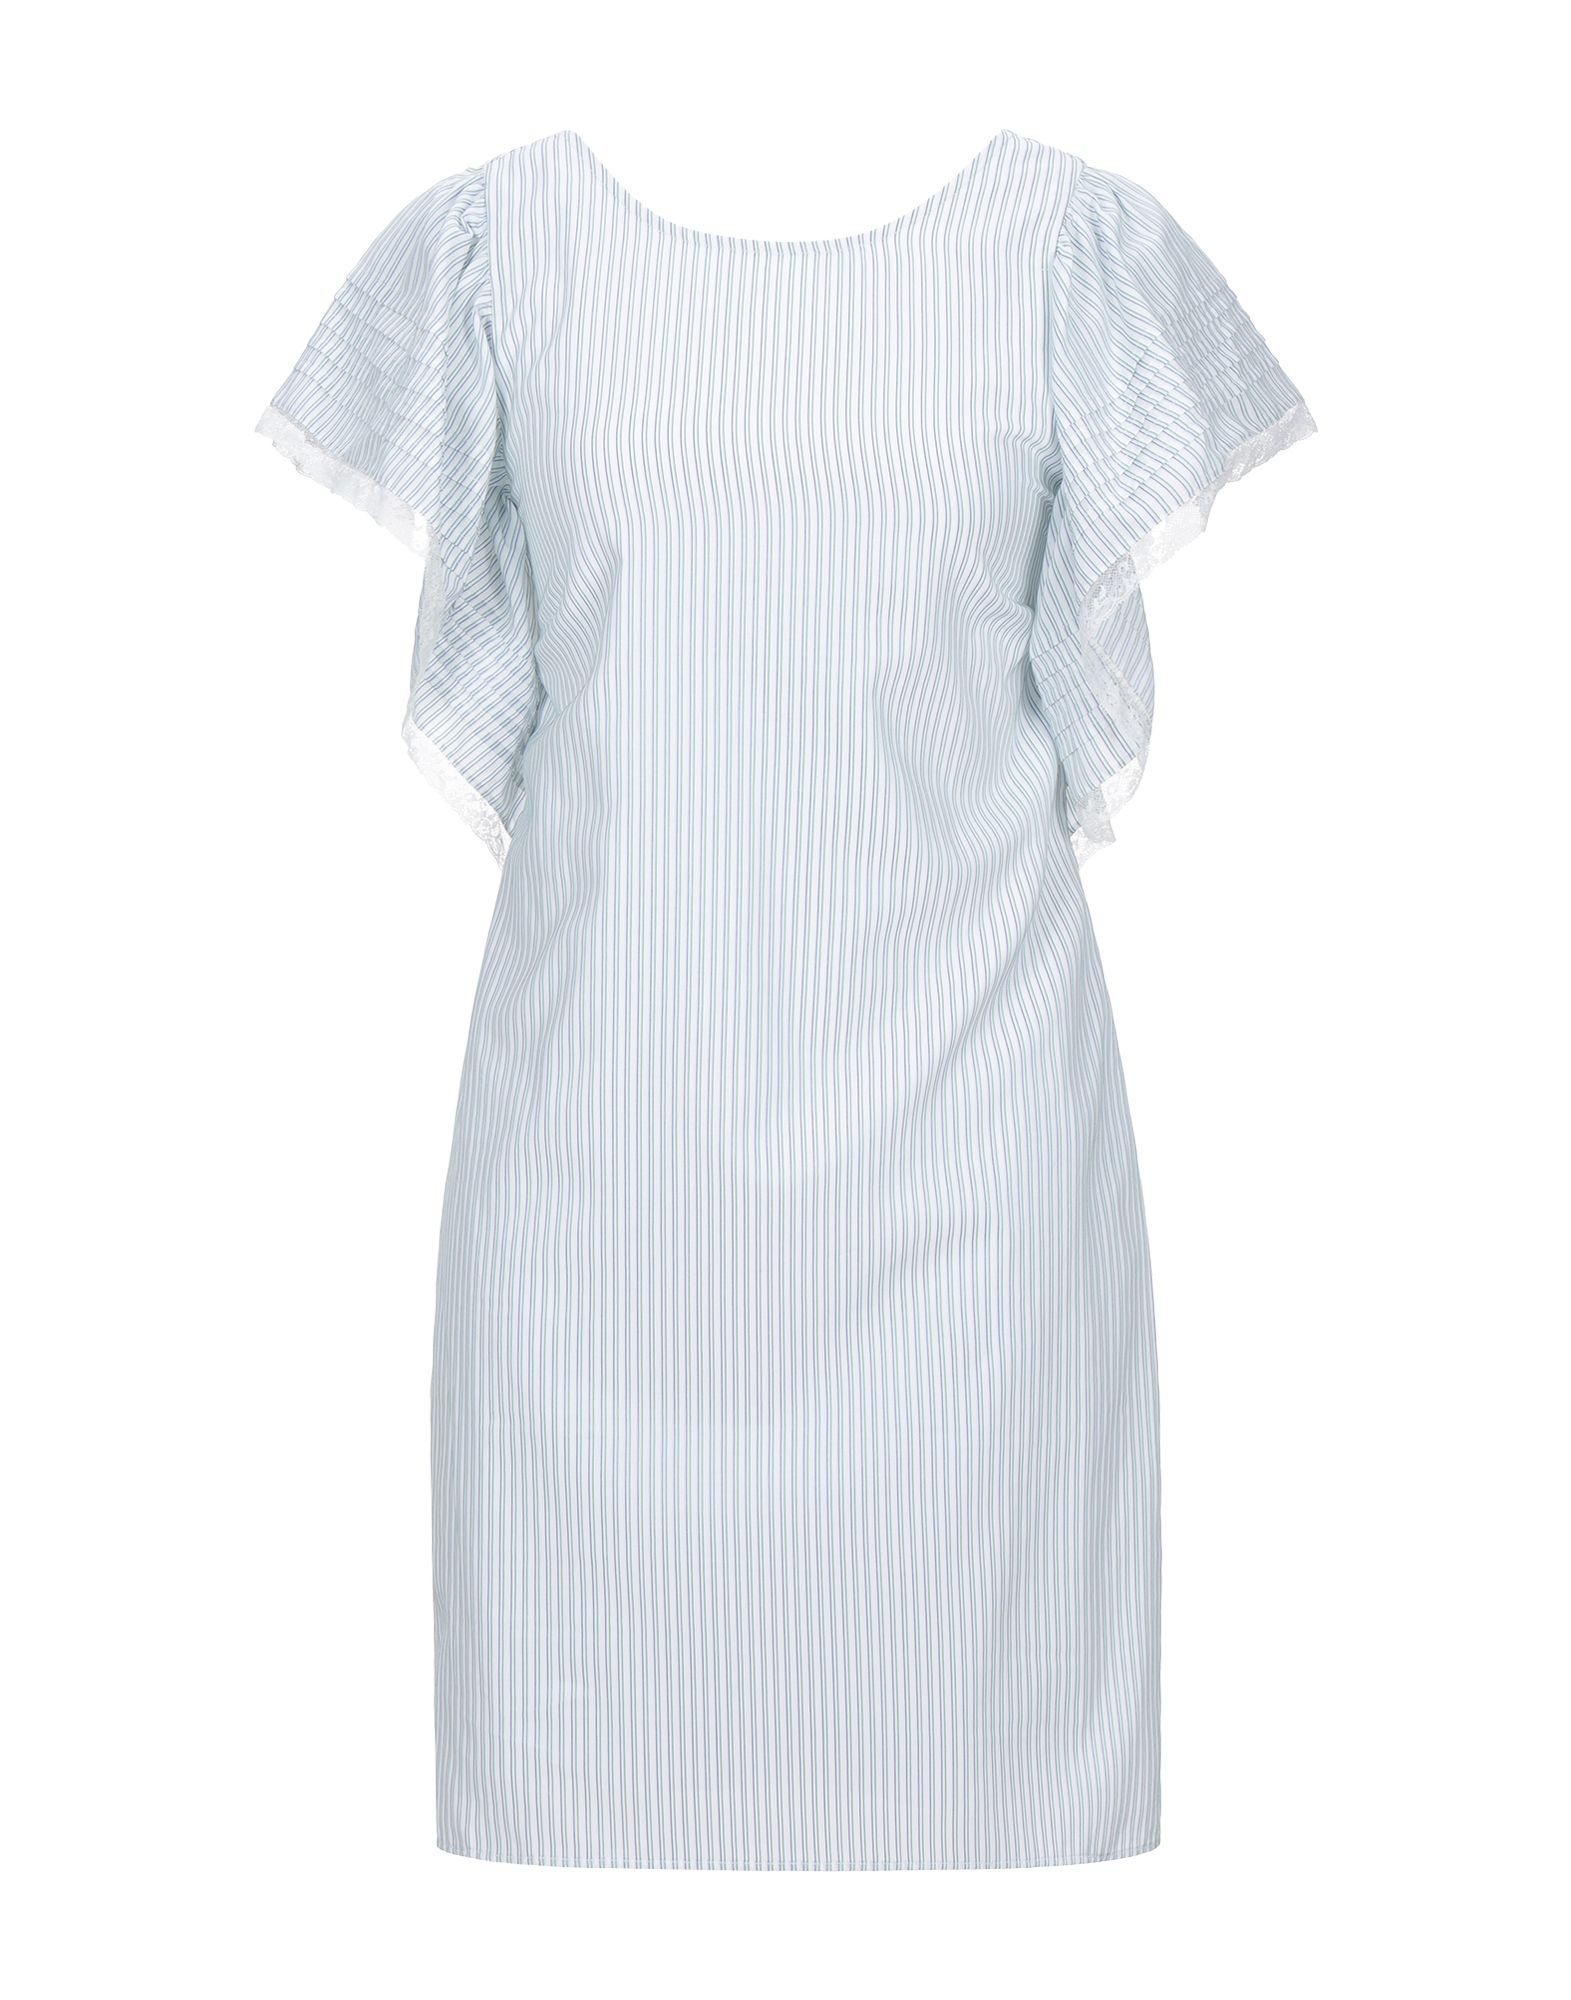 PAUL & JOE SISTER Короткое платье